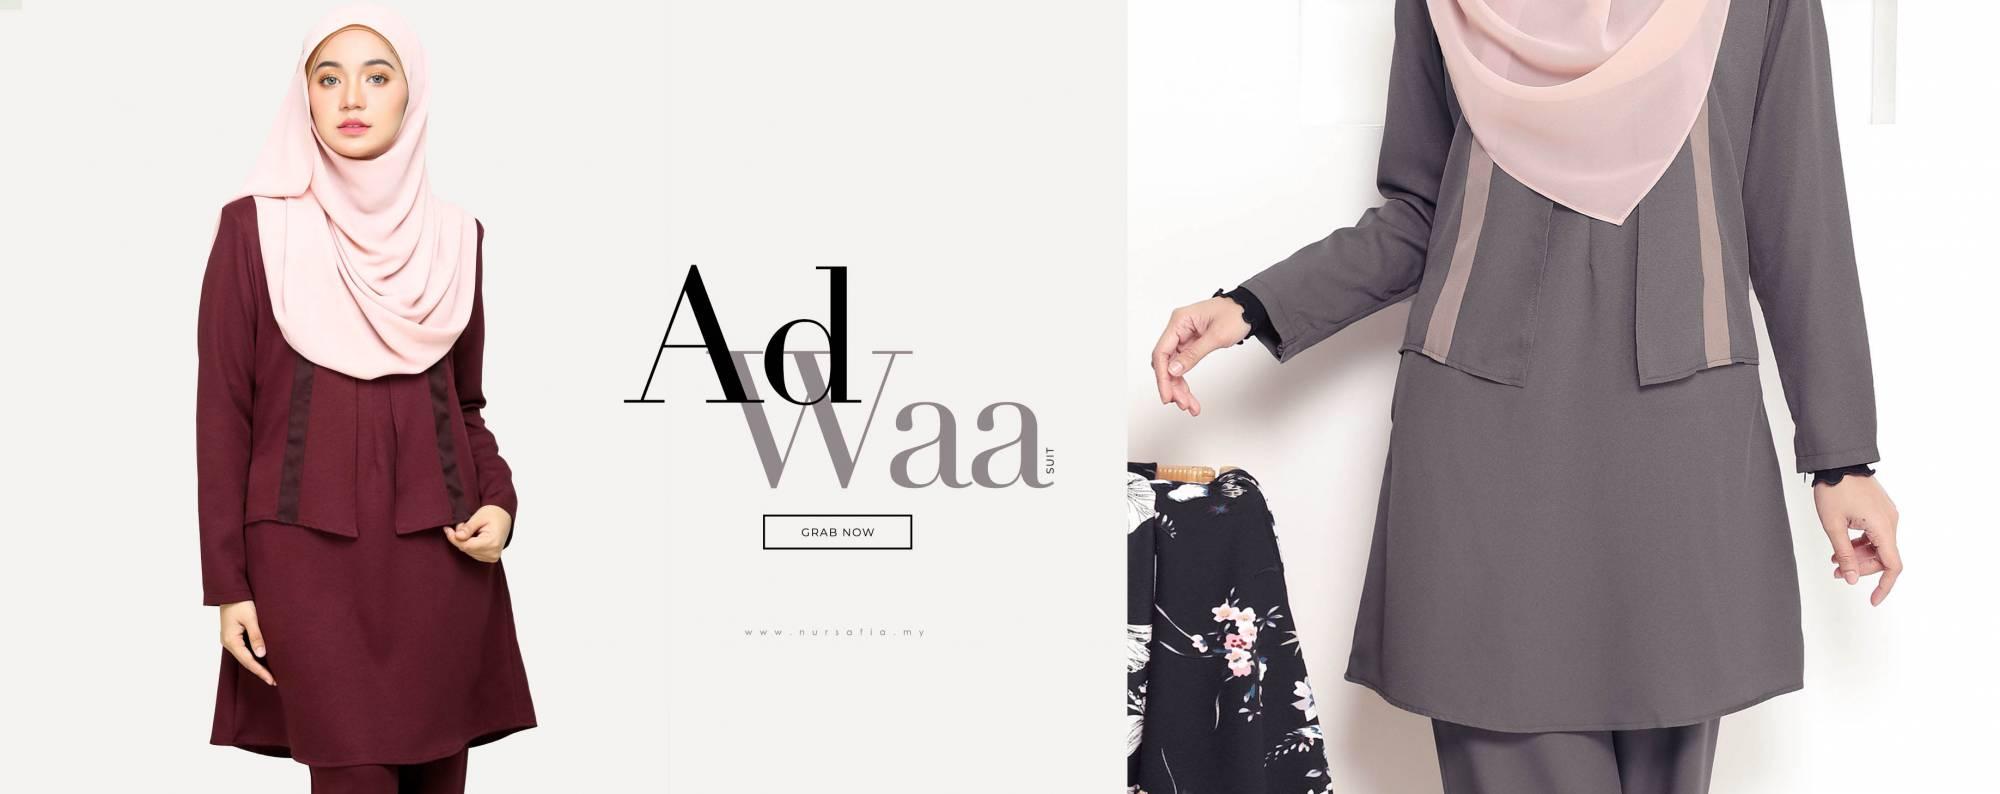 Adwaa Suit